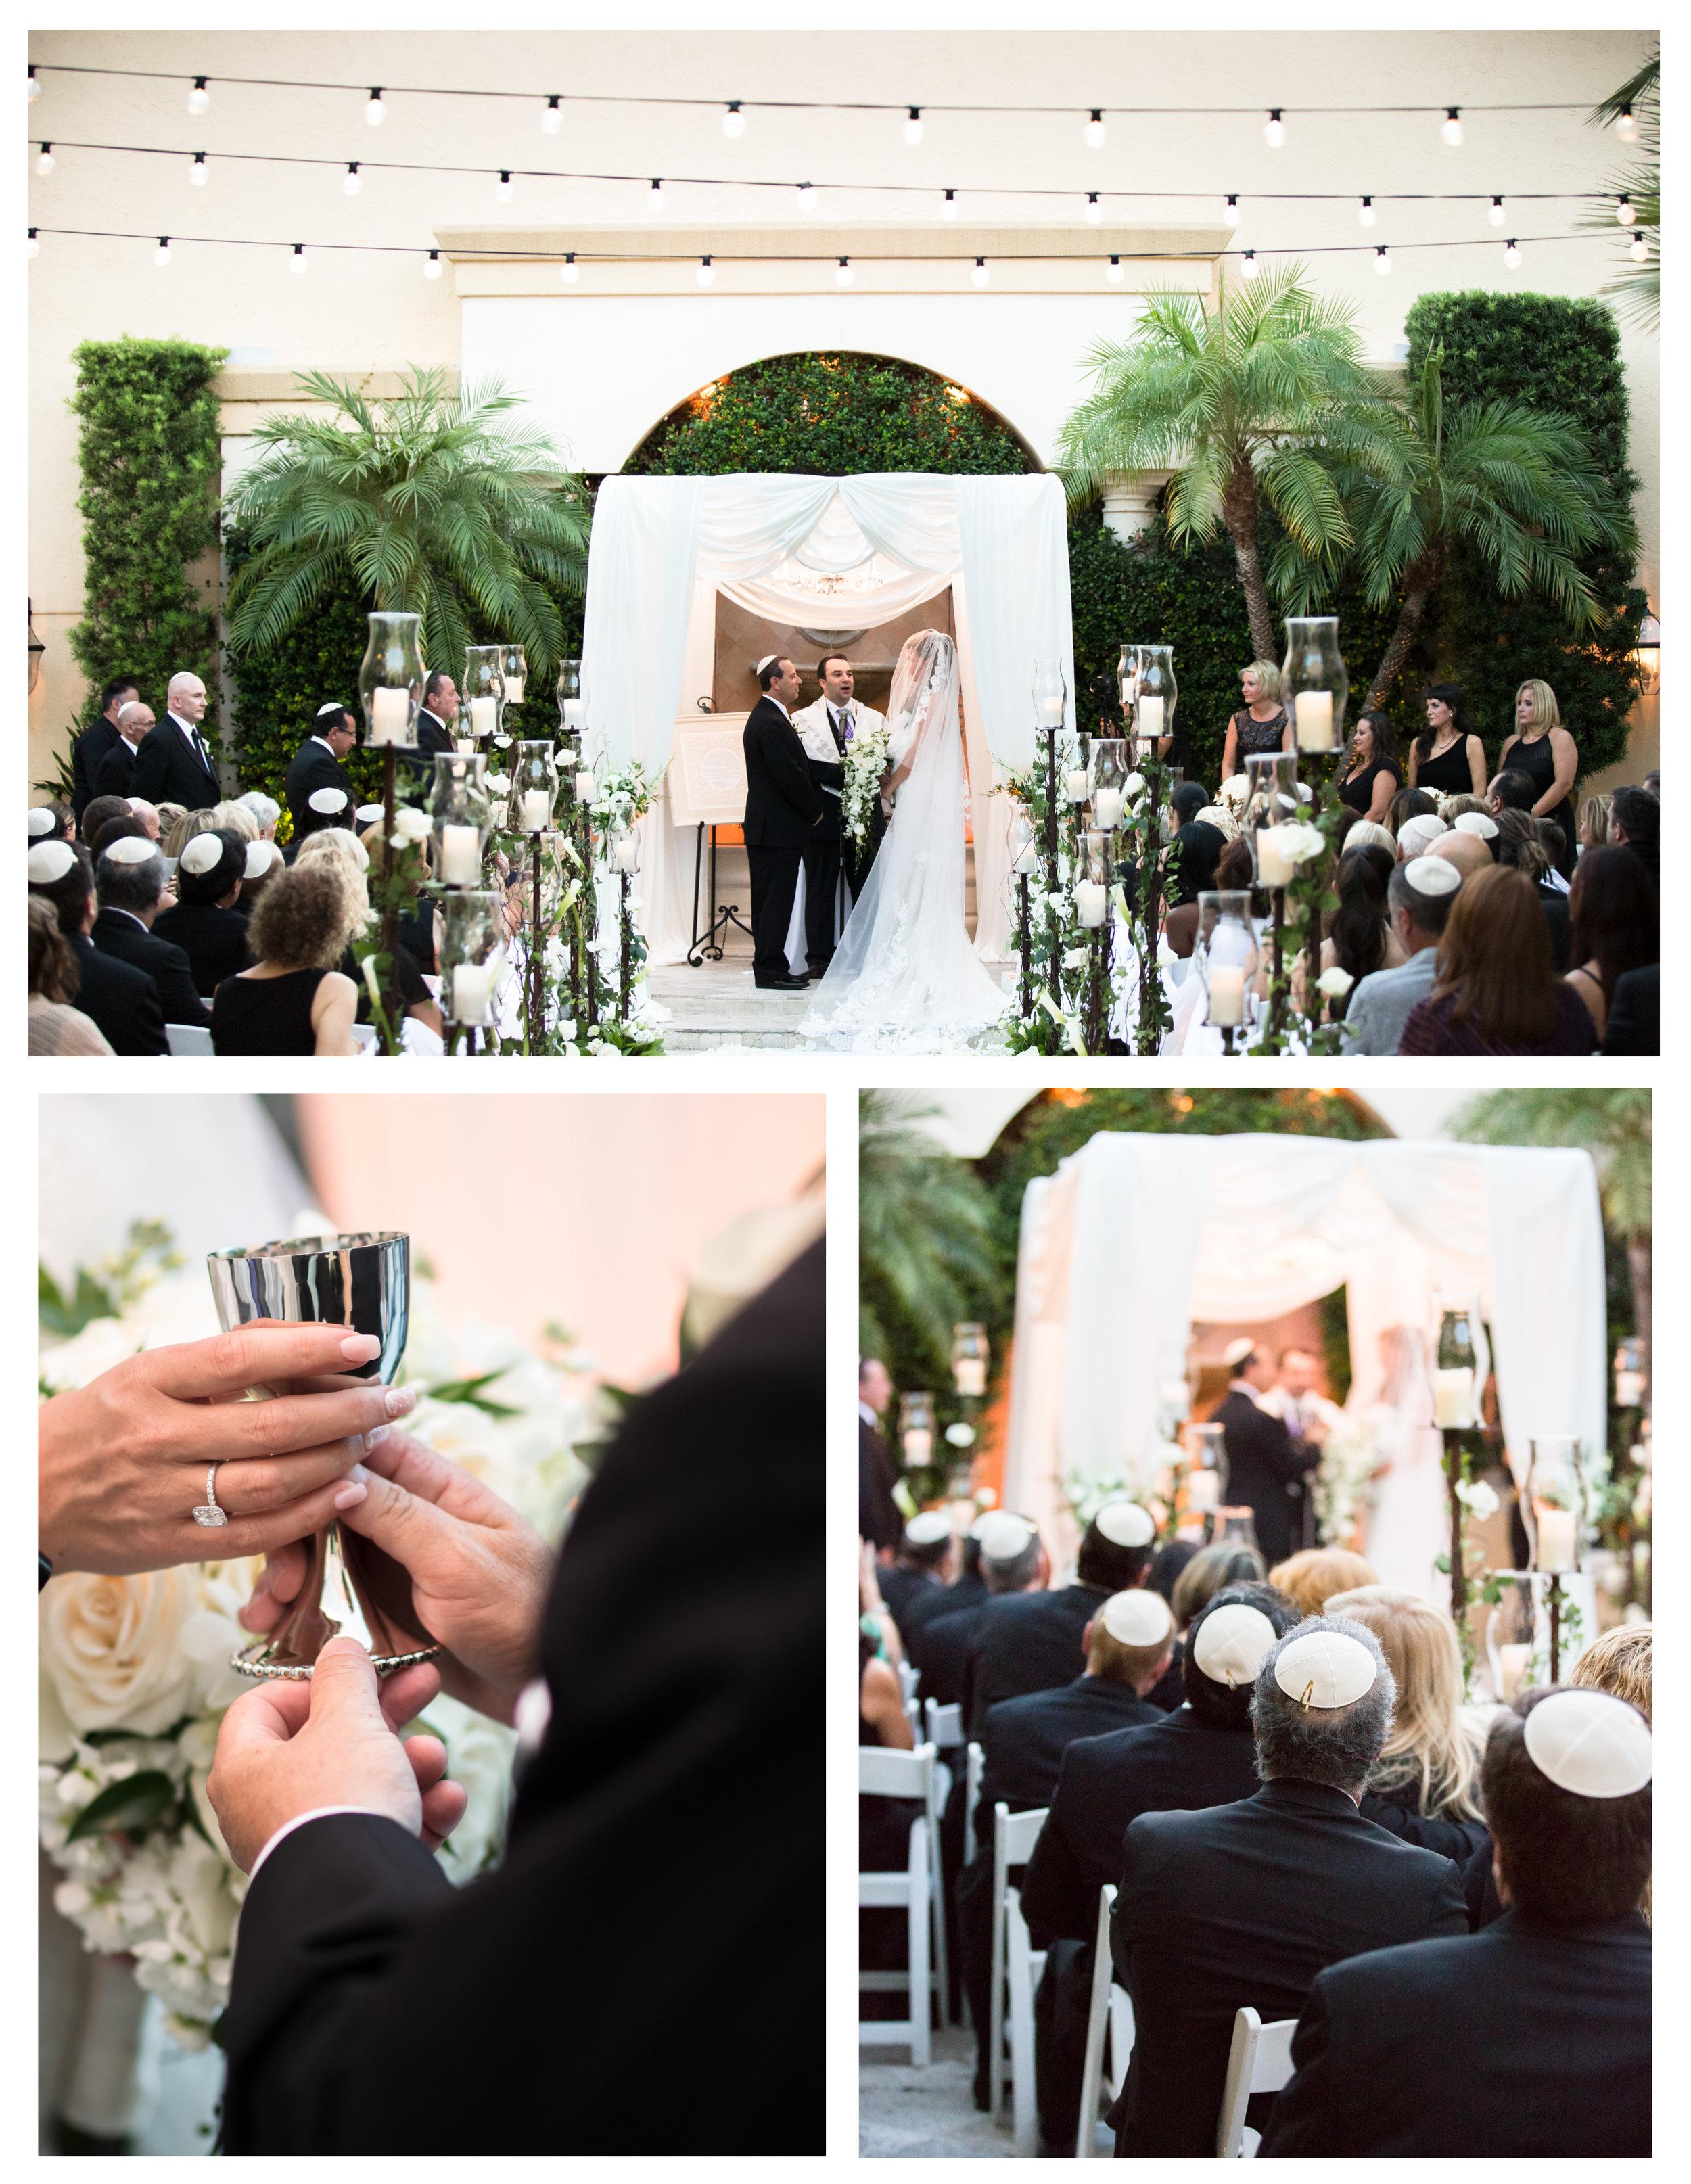 Benvenuto_Boynton_Beach_Wedding_Christine_and Doug_Married 6.jpg